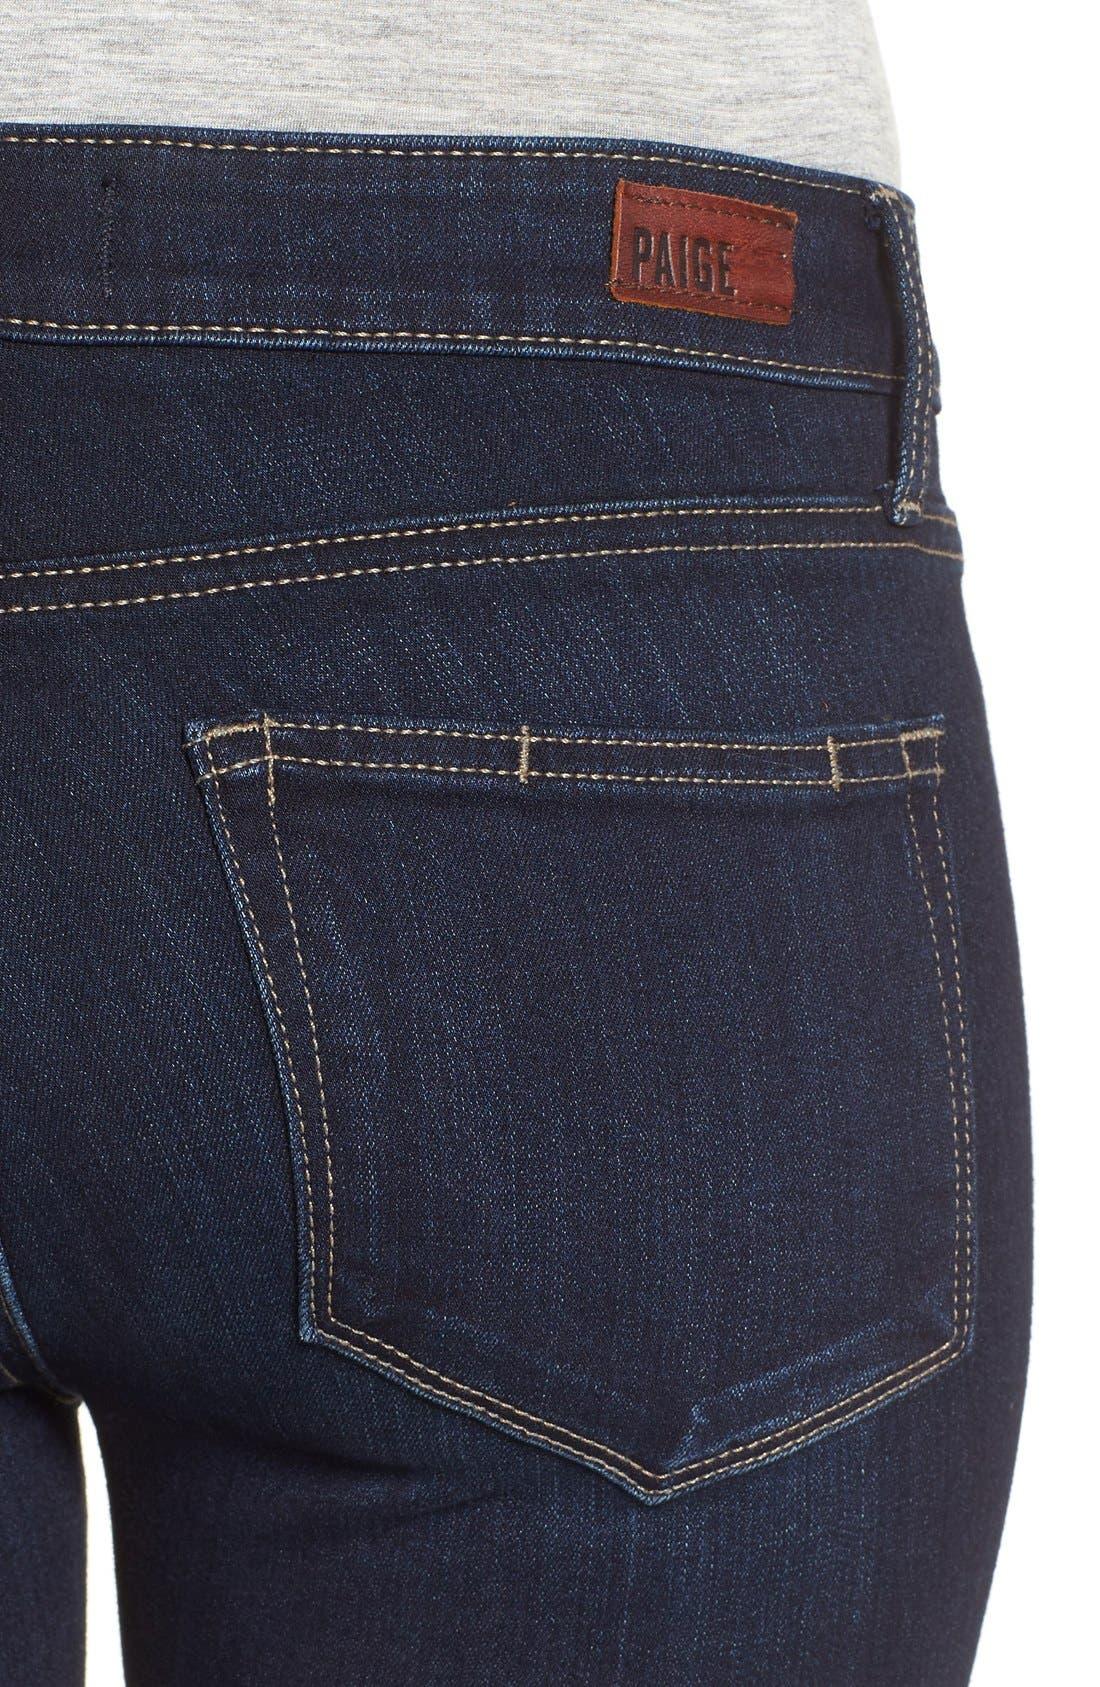 Alternate Image 5  - PAIGE 'Transcend - Verdugo' Ankle Skinny Jeans (Tari)